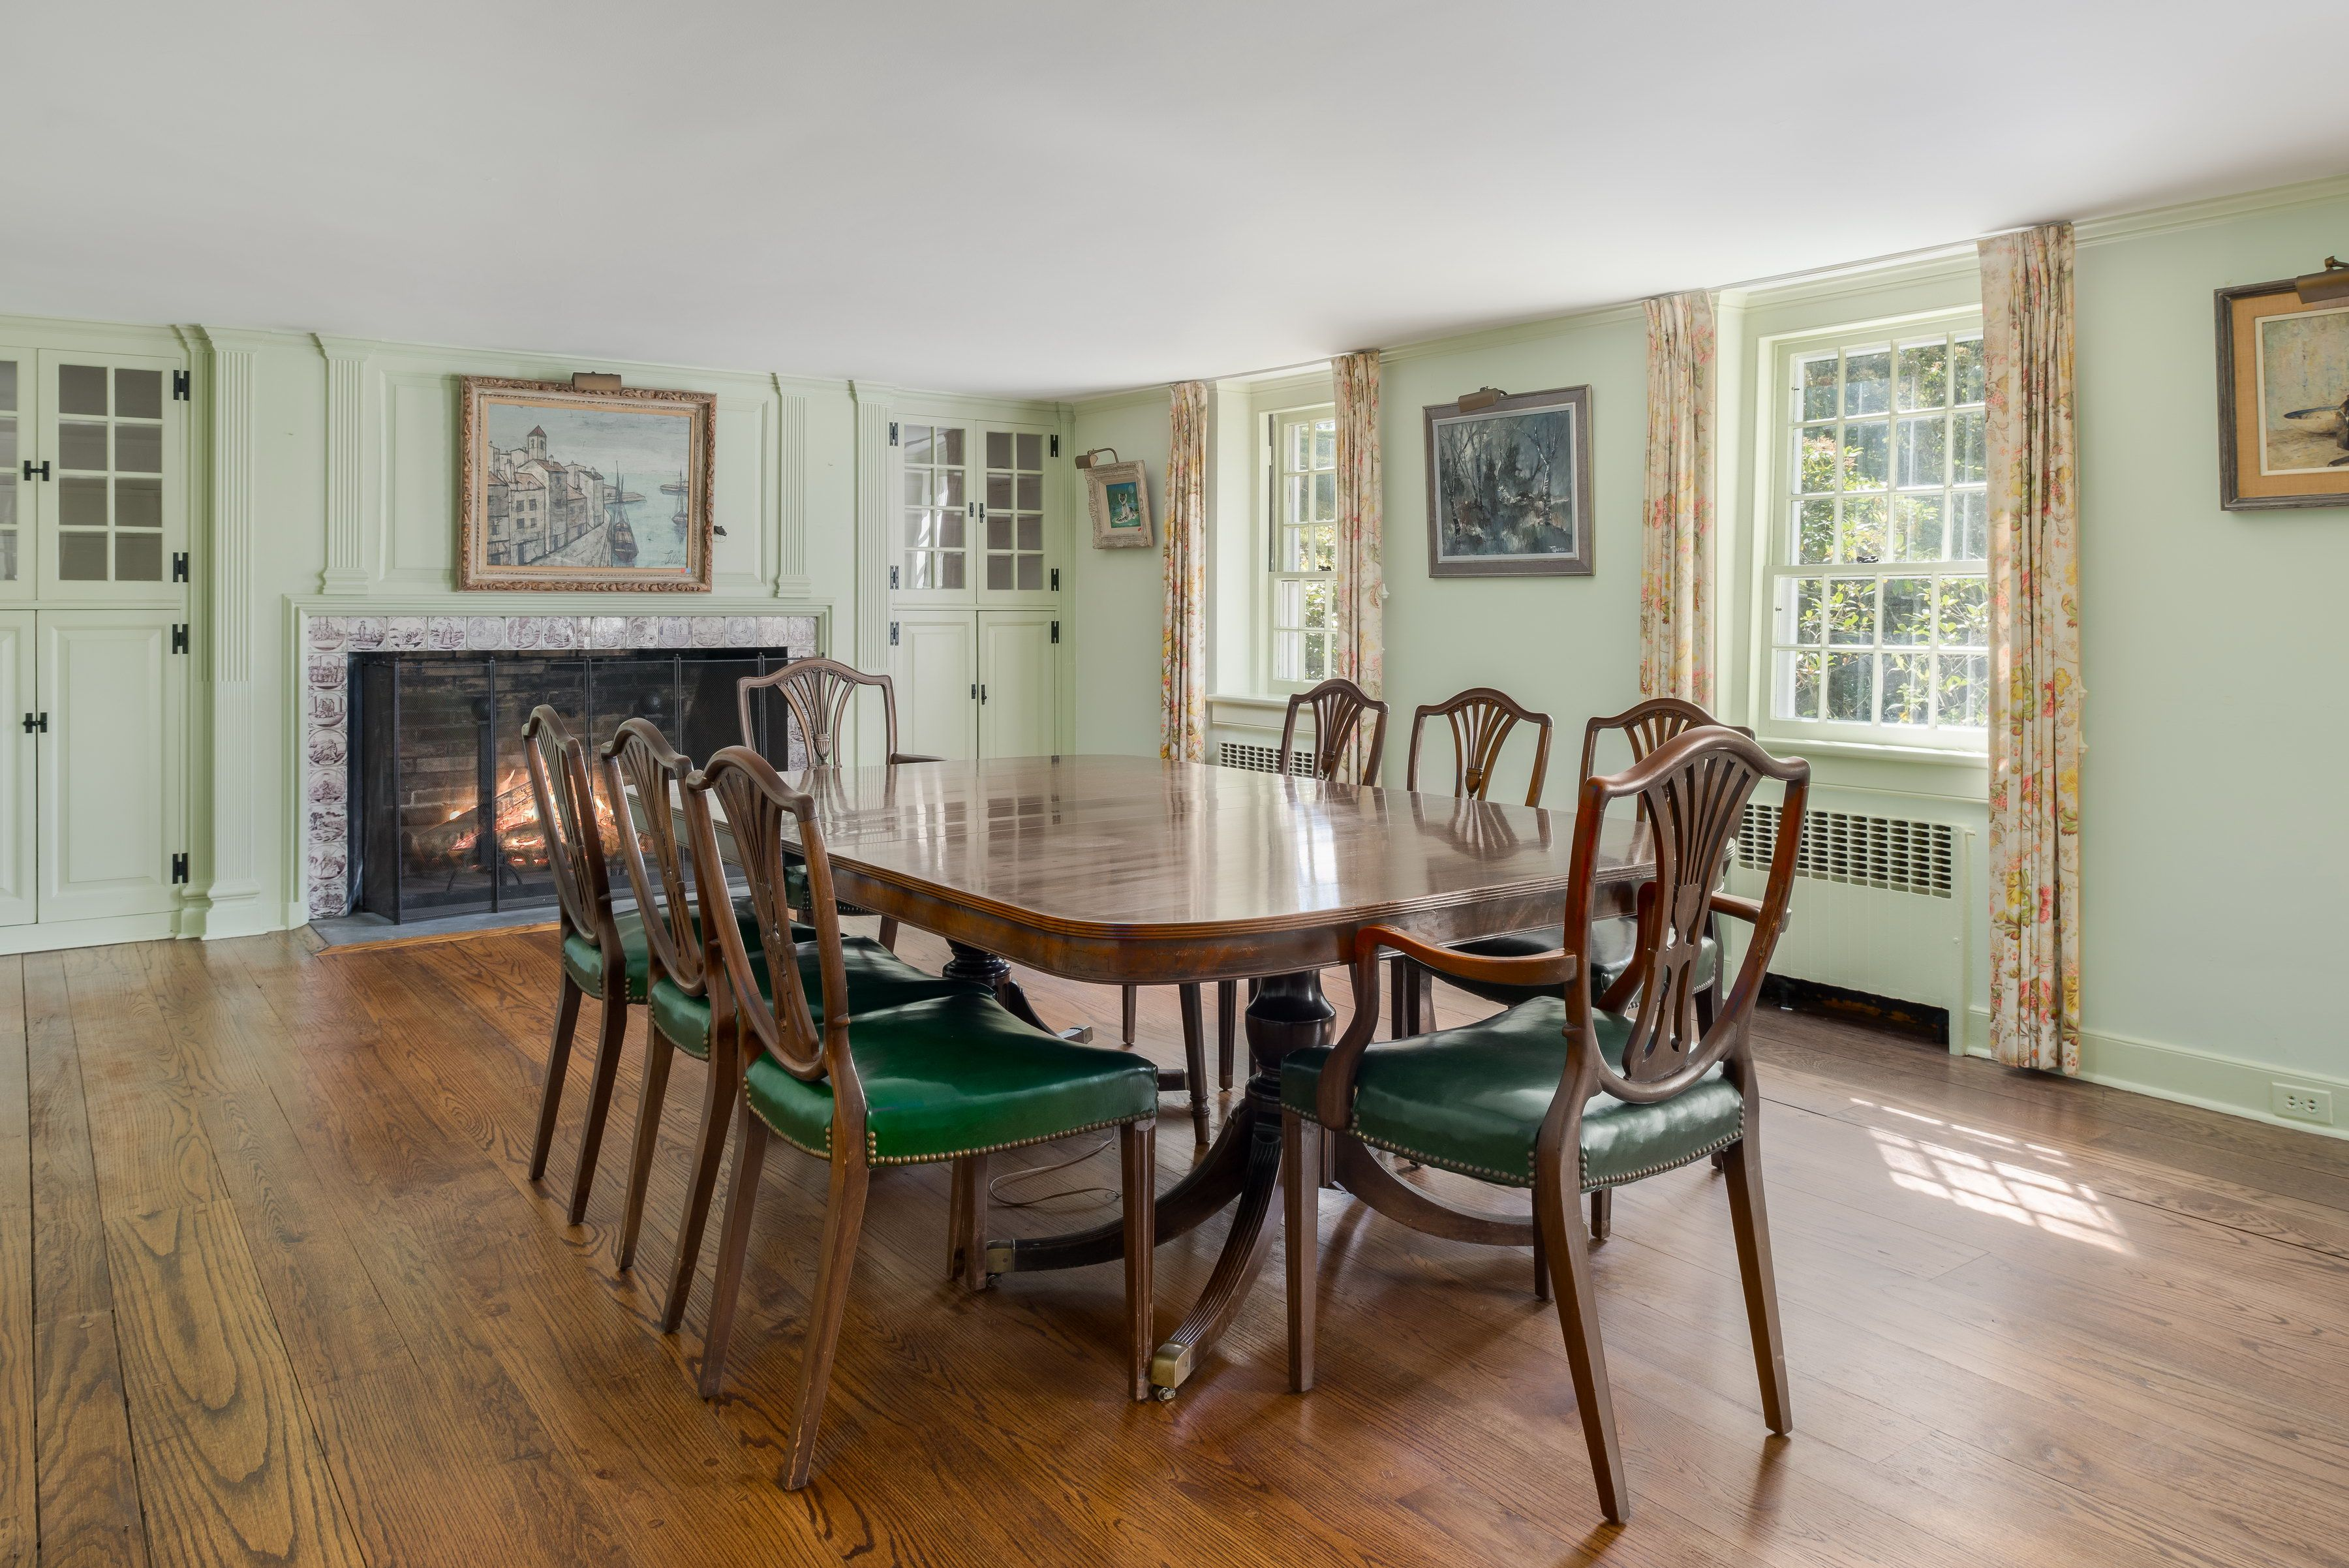 George Gershwin House